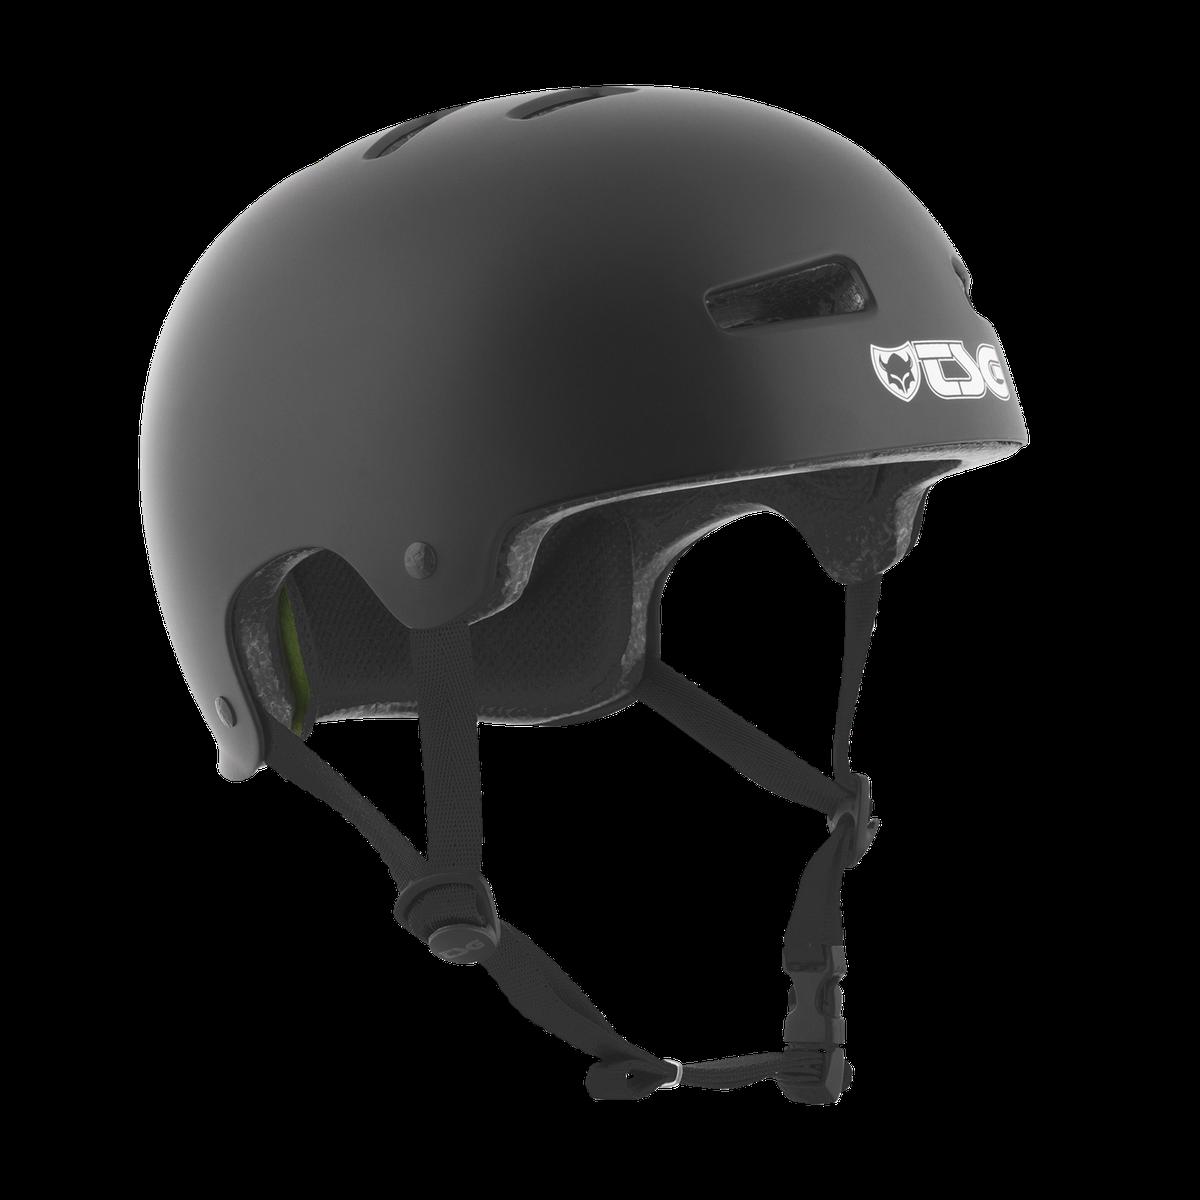 Evolution BMX Helmet 18, cykelhjelm | Helmets